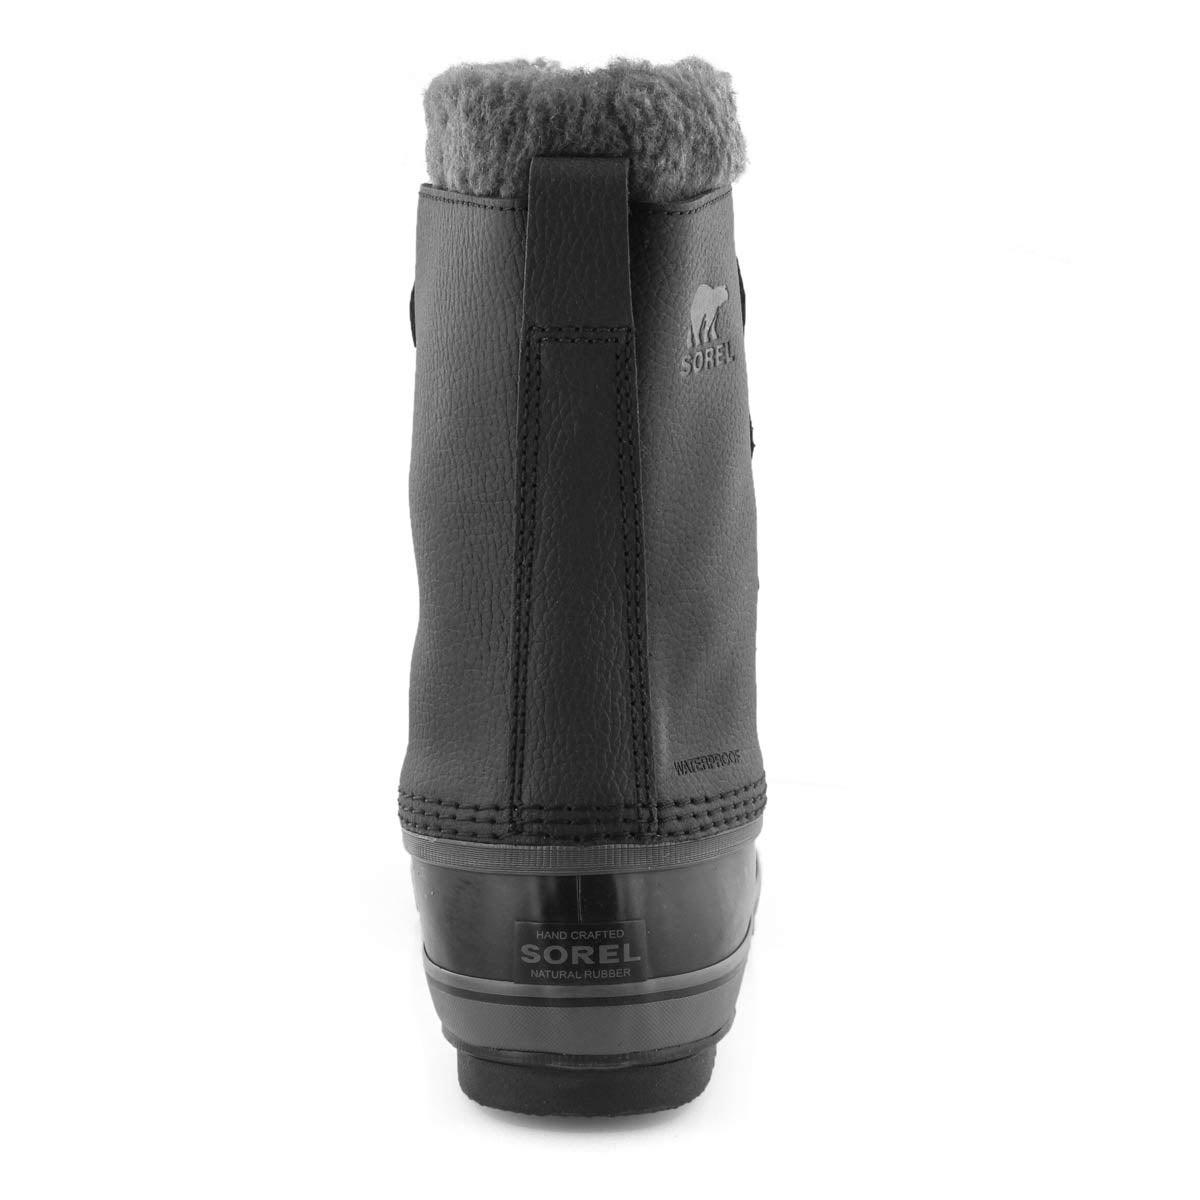 Mns 1964 Pac T black wtpf wntr boot